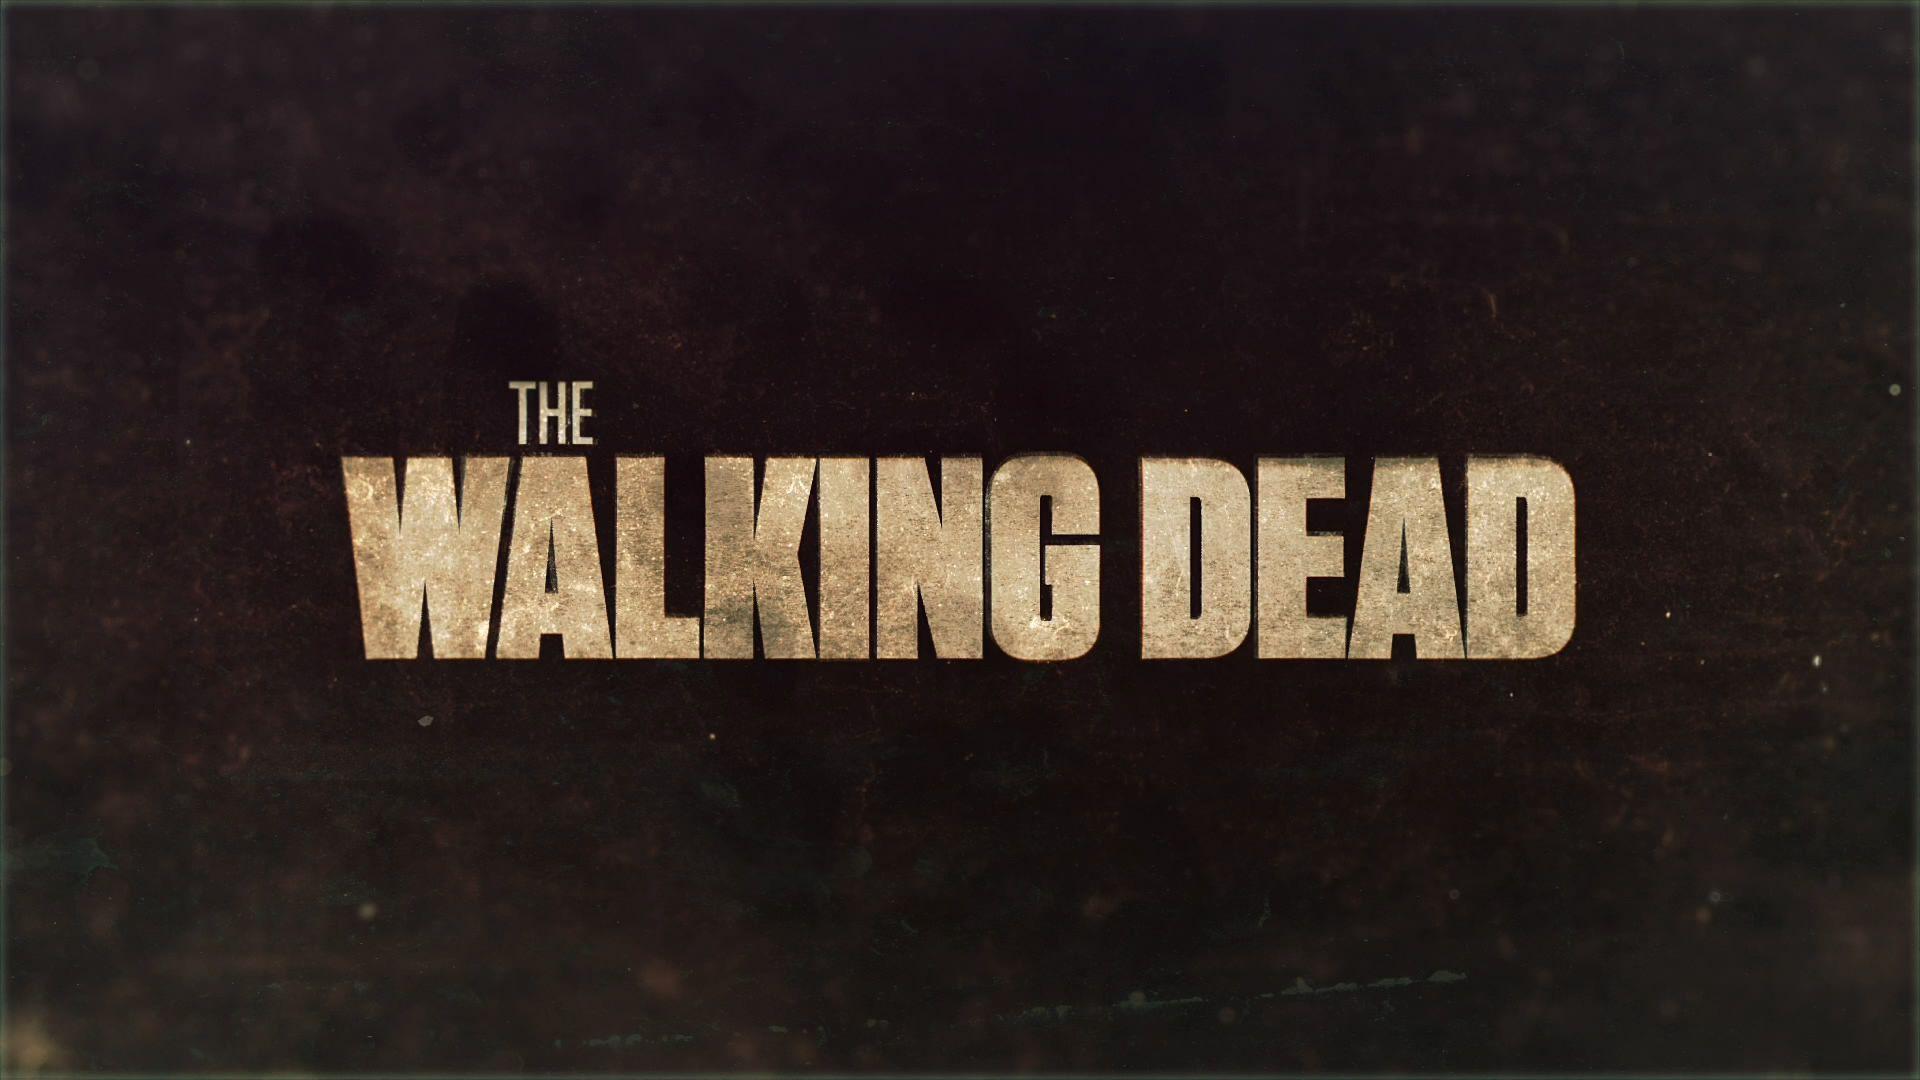 The Walking Dead Com Imagens Papel De Parede The Walking Dead